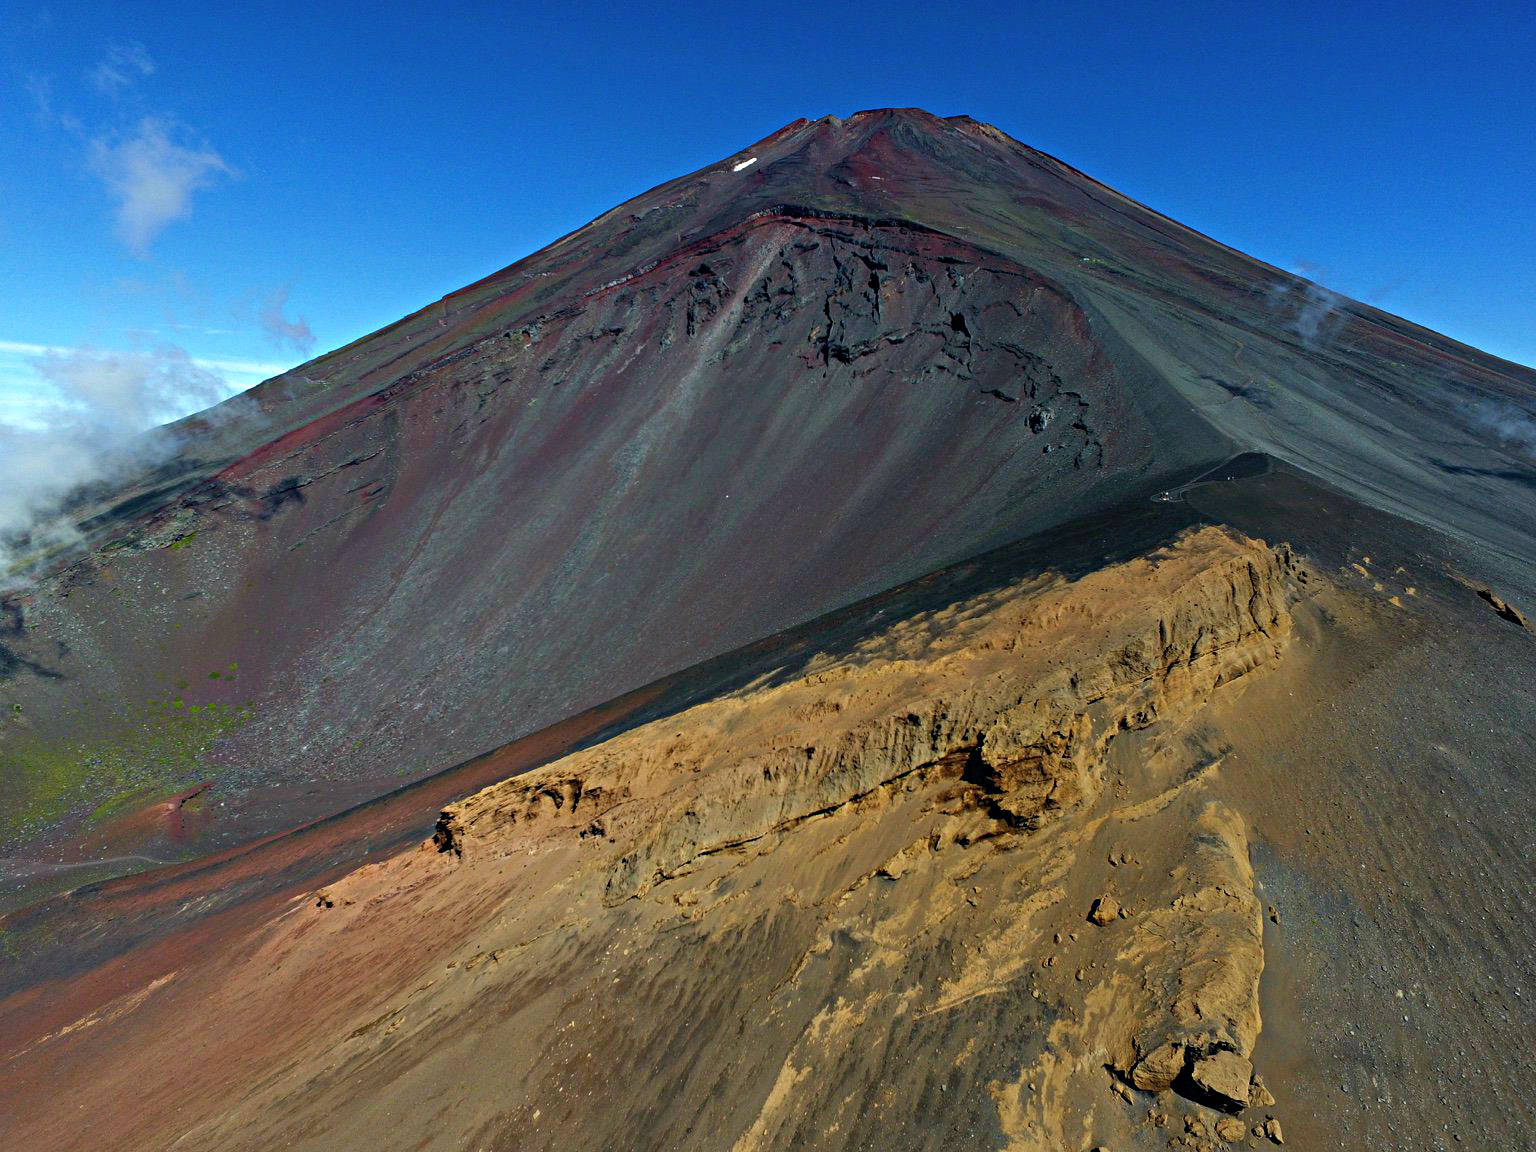 2 Day Mt Fuji Climbing Private Tour Gotemba Trail Prince Route Fujisan Curator